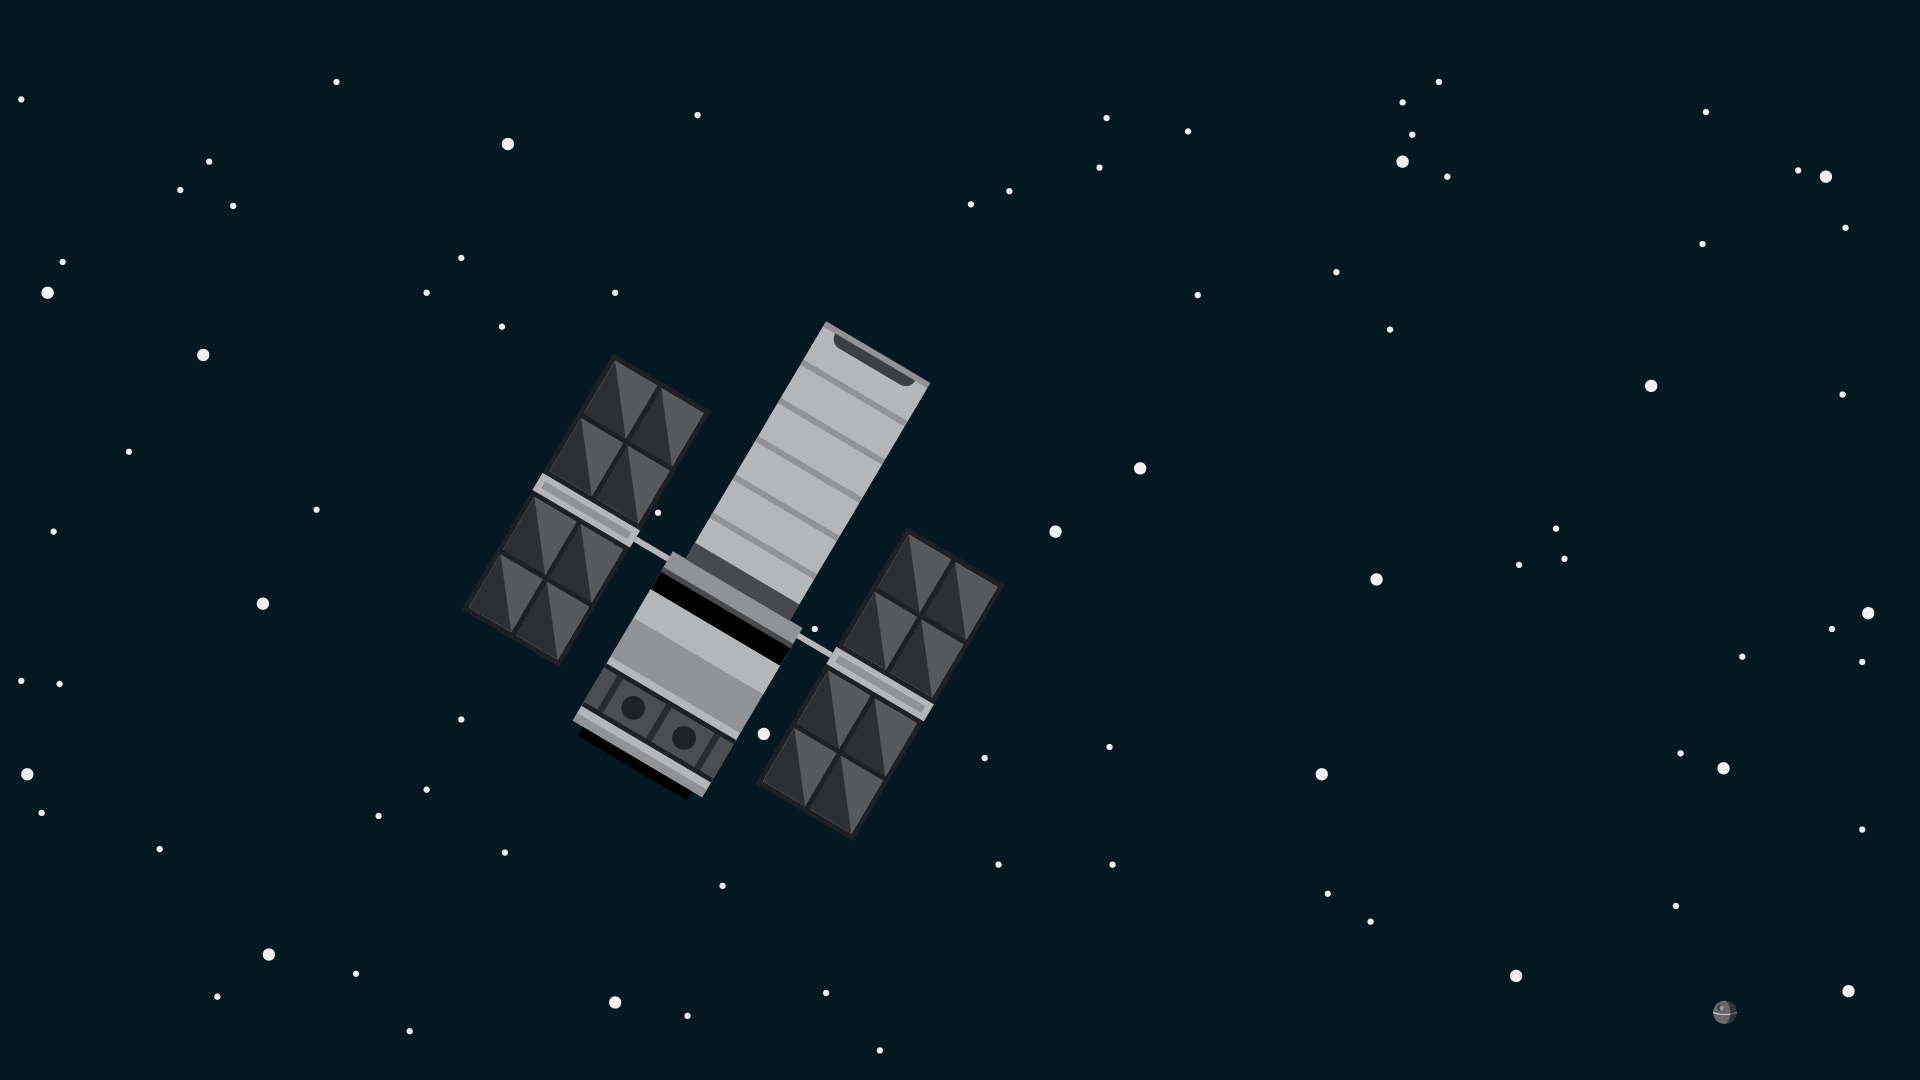 320_Big Bang_Kurzgesagt Project Pic 1